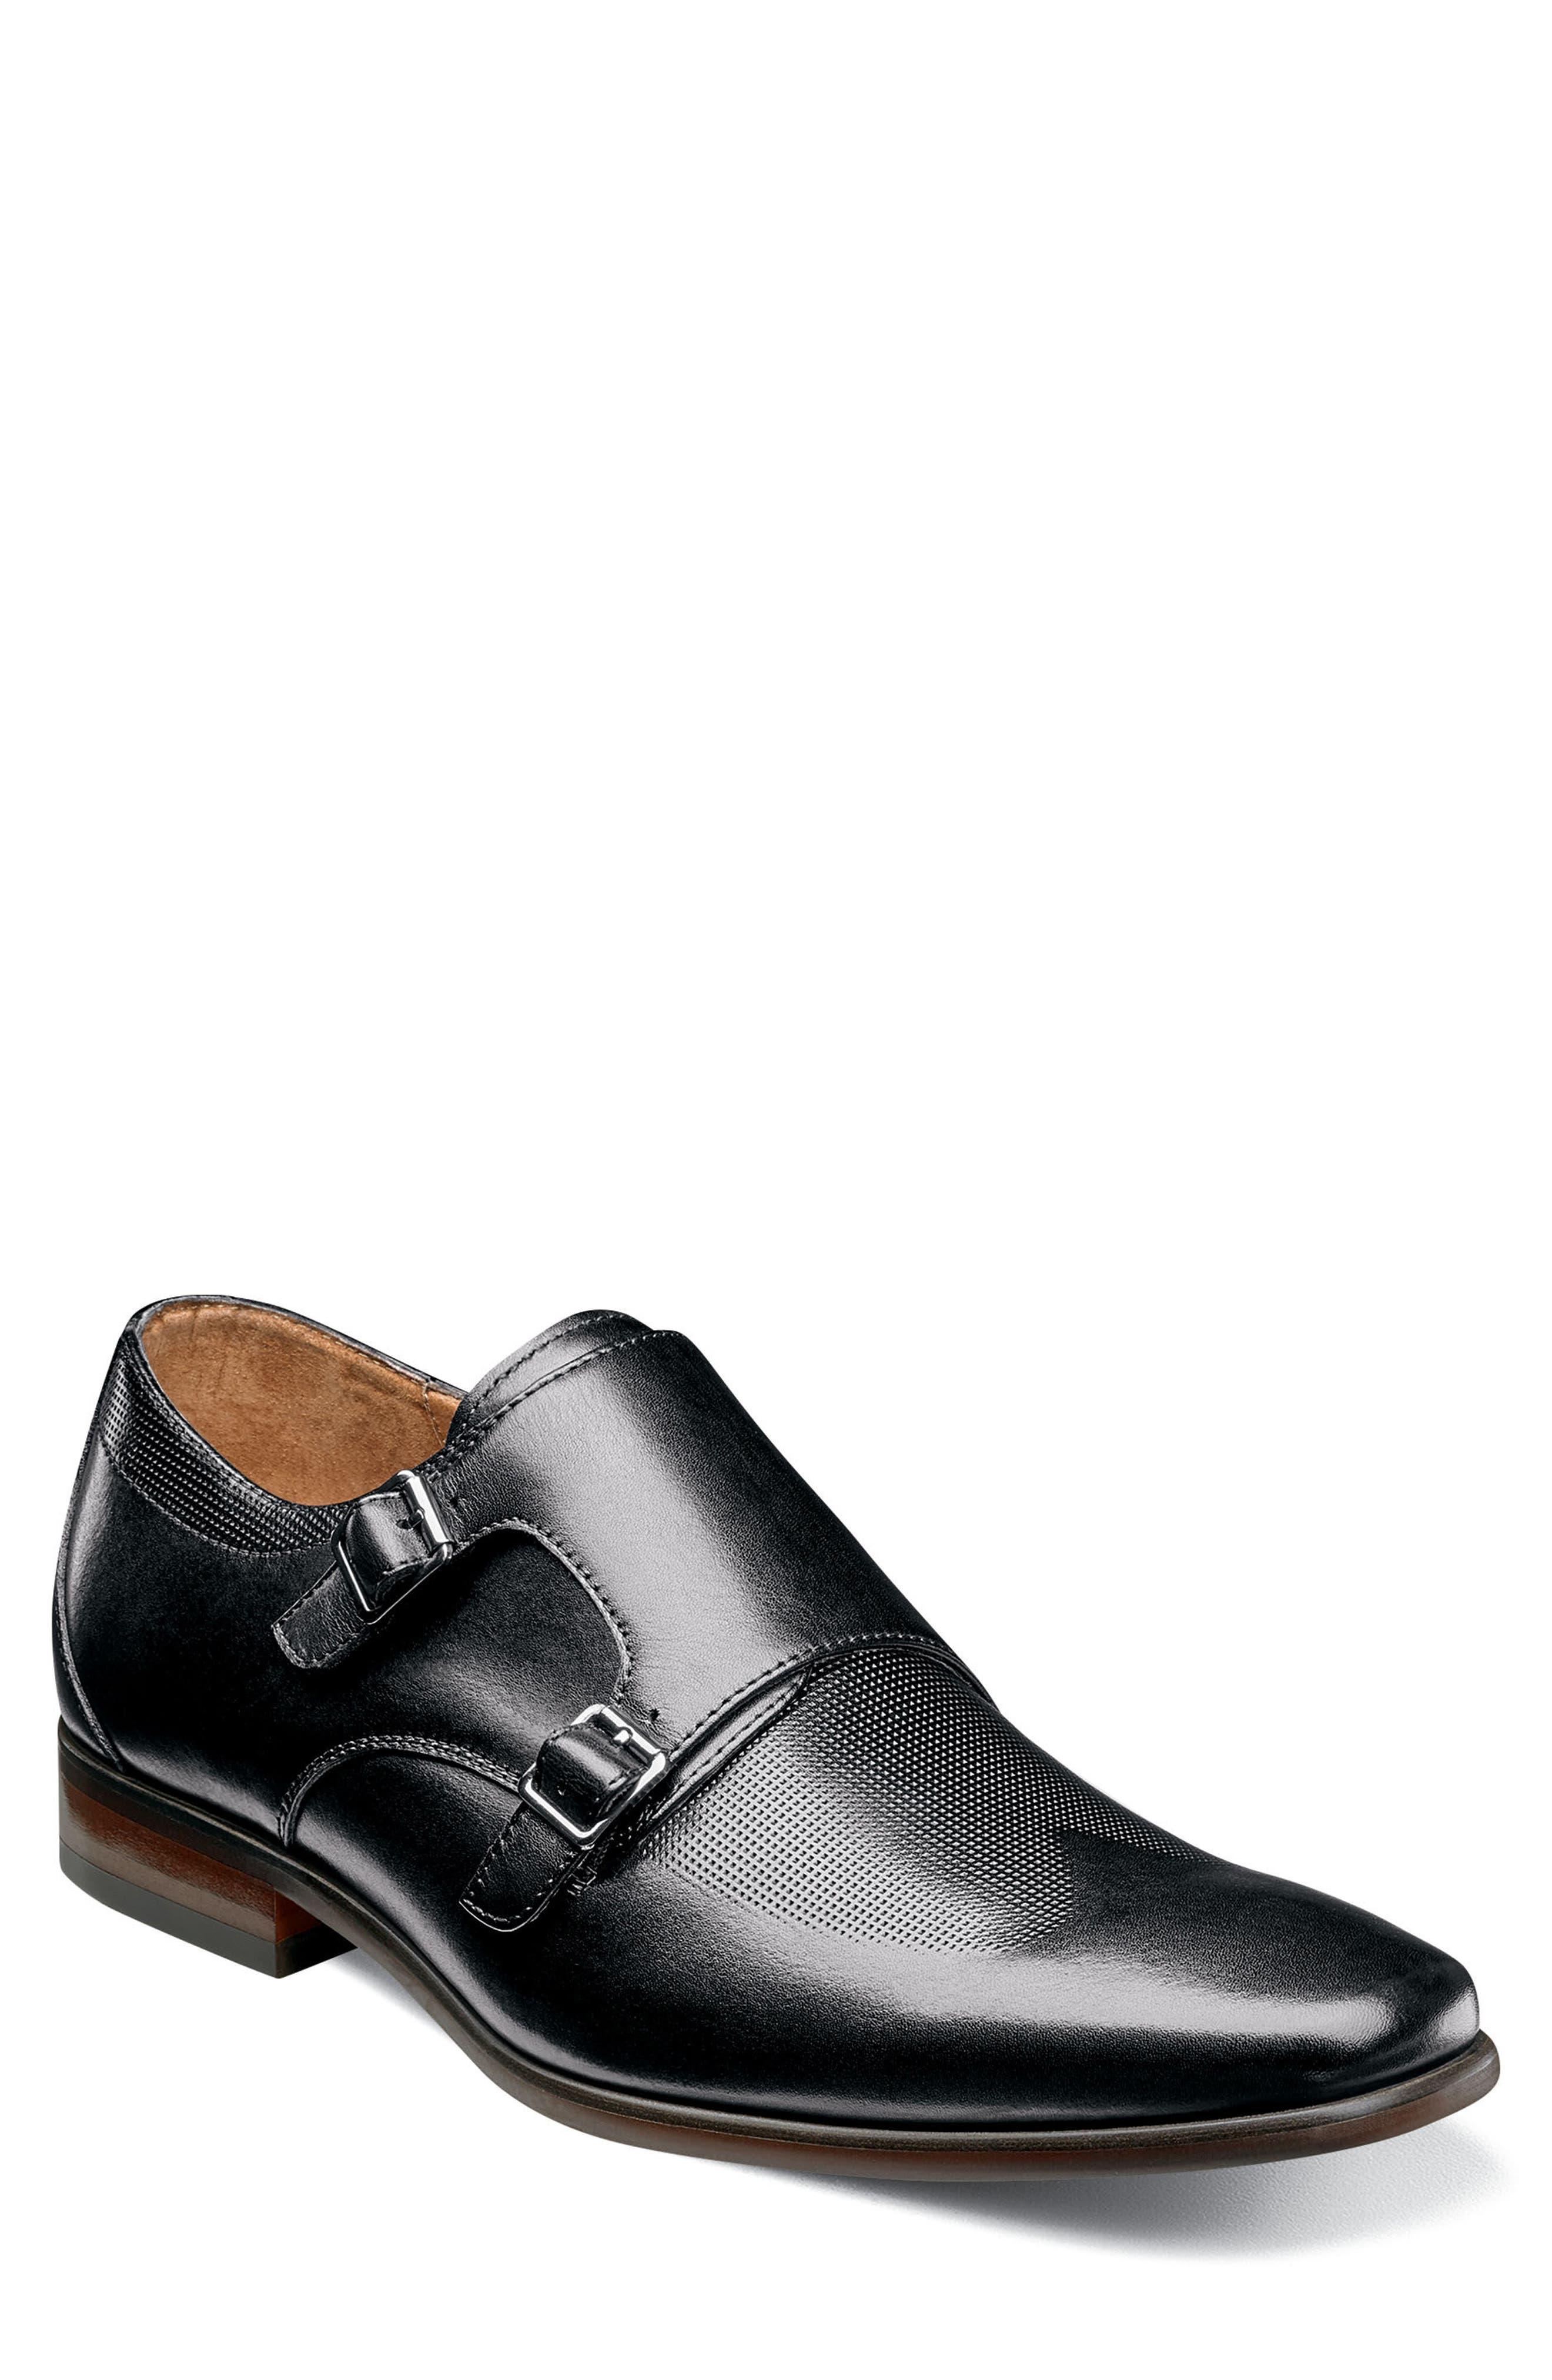 FLORSHEIM Postino Textured Double Strap Monk Shoe, Main, color, BLACK LEATHER